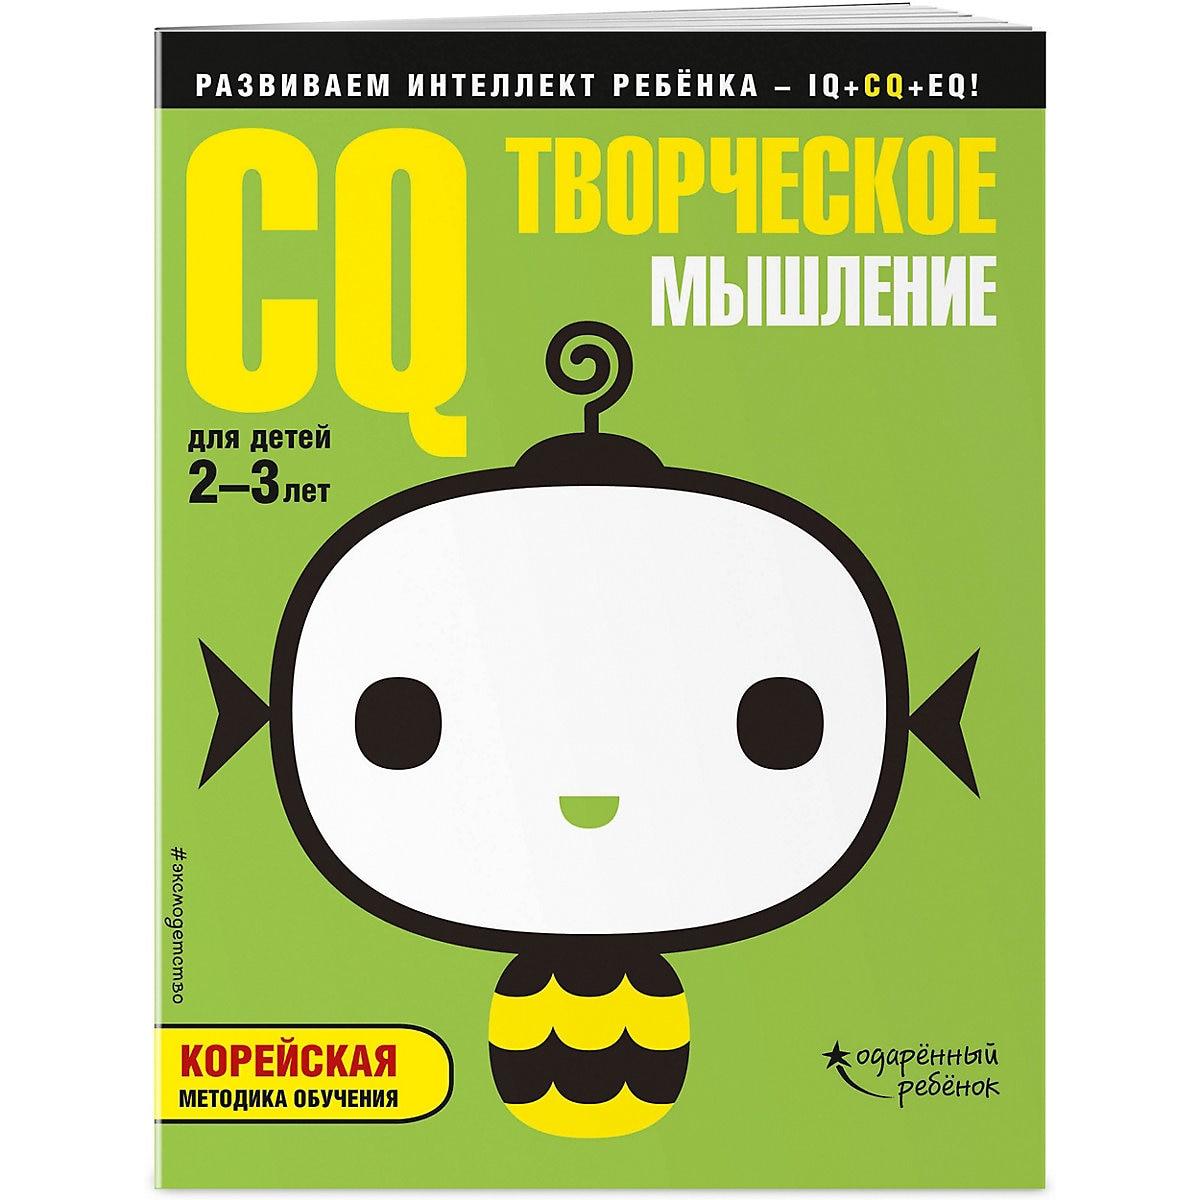 Books EKSMO 9555929 Children Education Encyclopedia Alphabet Dictionary Book For Baby MTpromo